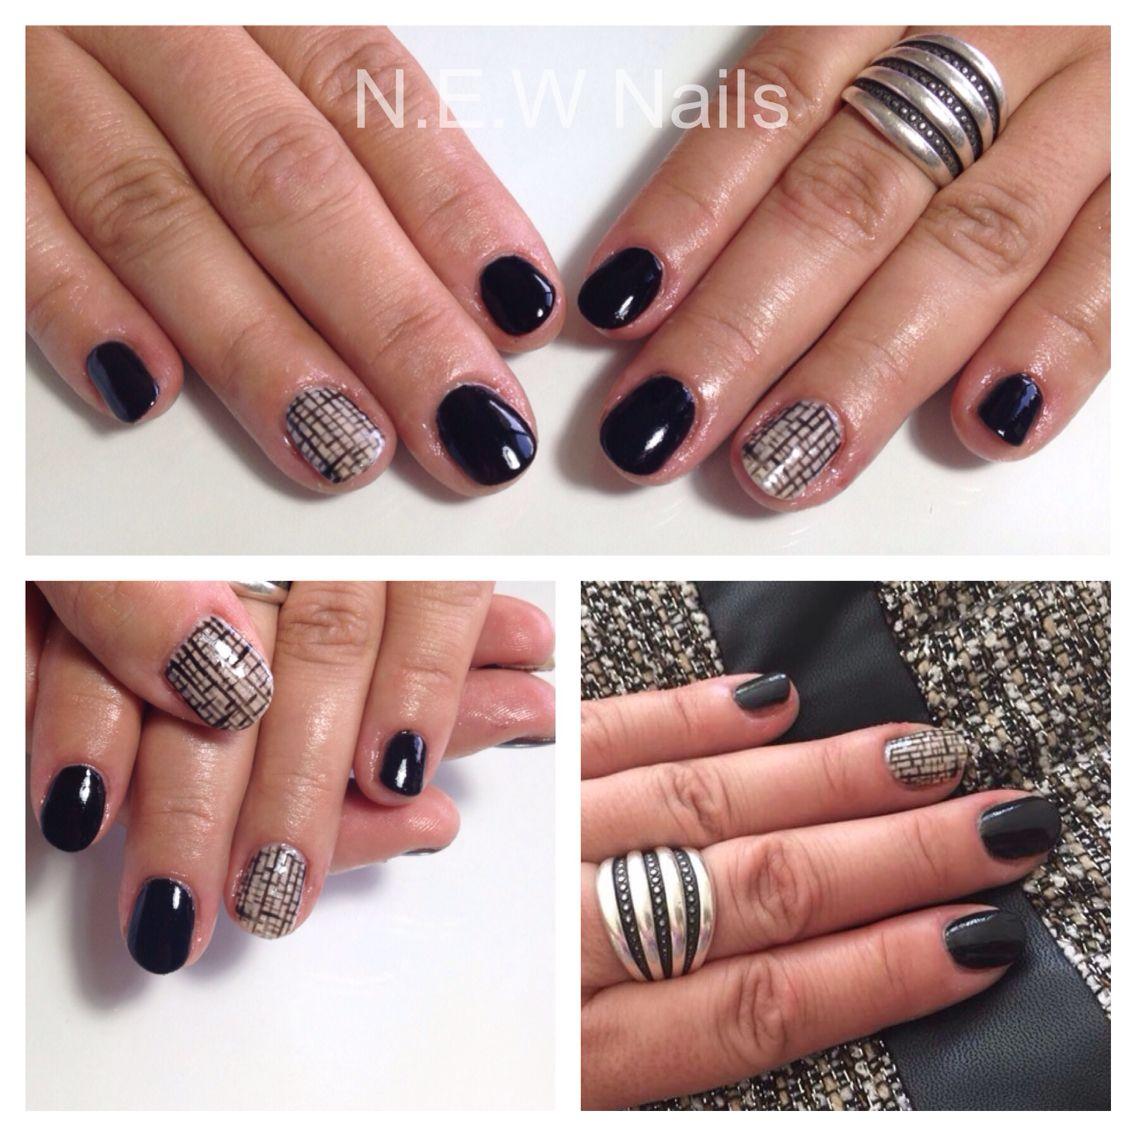 N.E.W - Nails for Events & Weddings, nails, nail art, nail designs ...